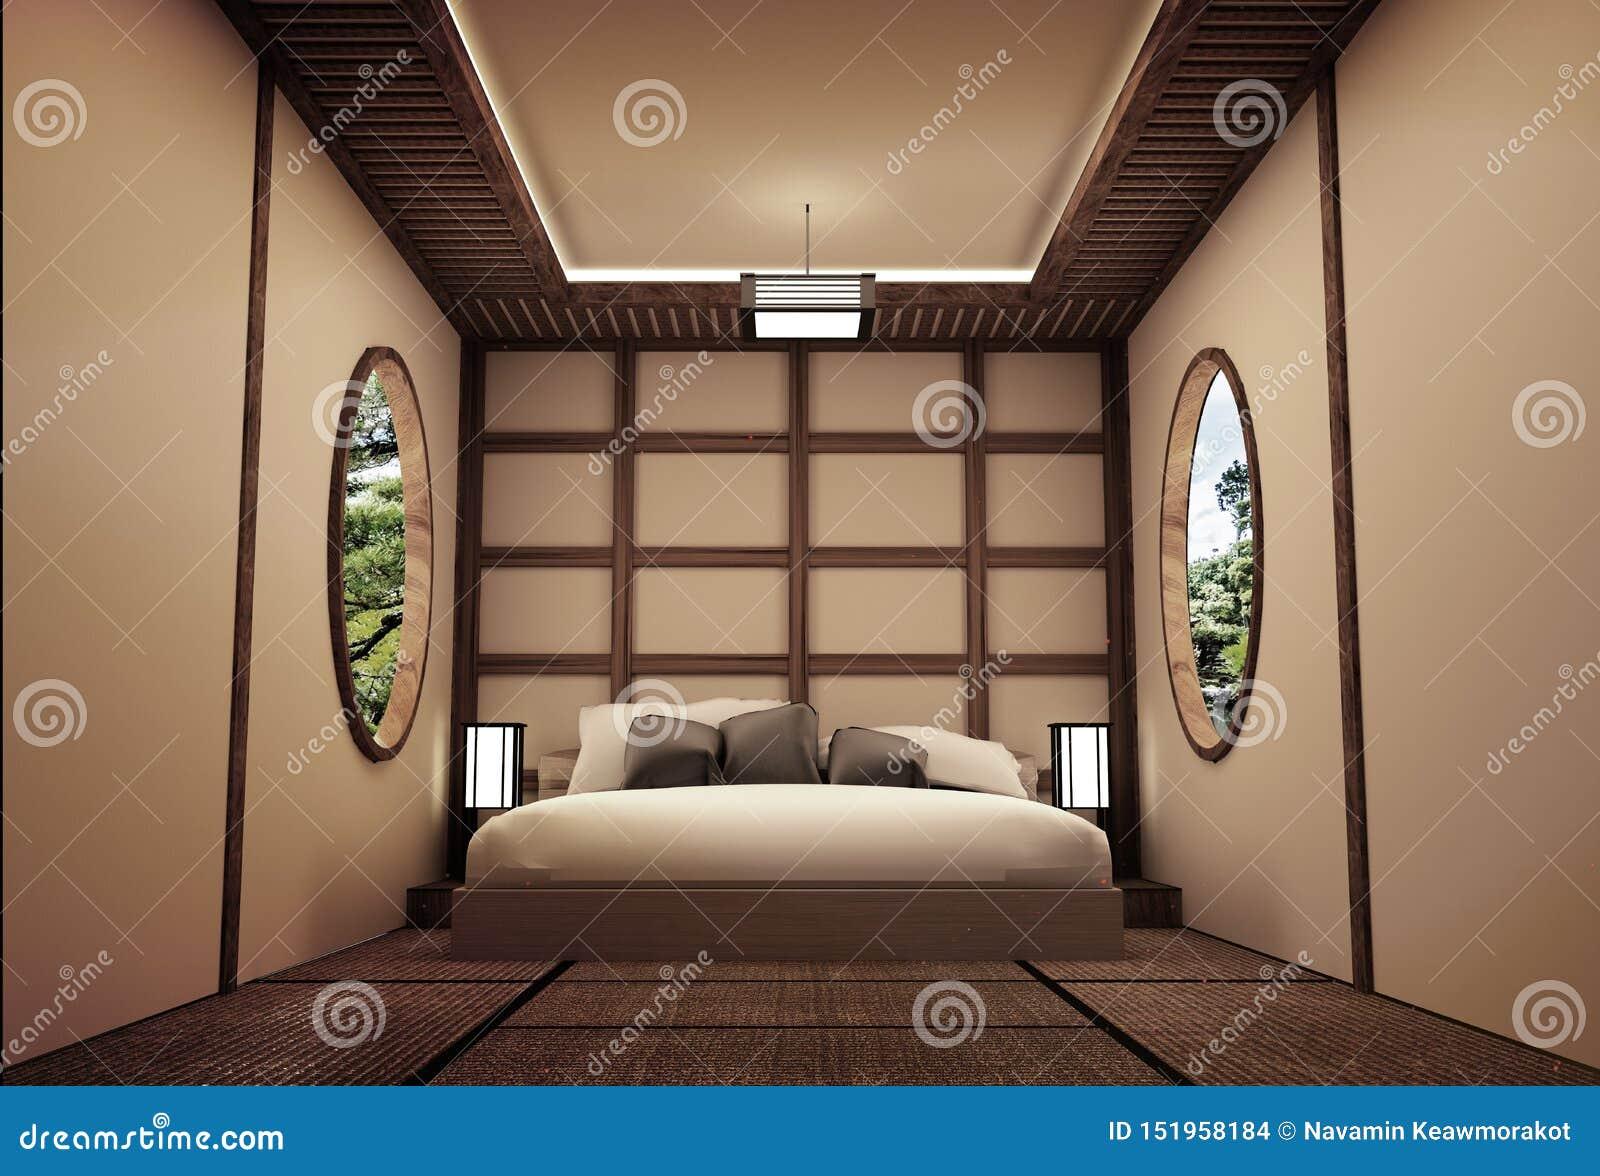 Traditional Japanese Style Bedroom Interior Design 3d Rendering Stock Illustration Illustration Of Home Japan 151958184